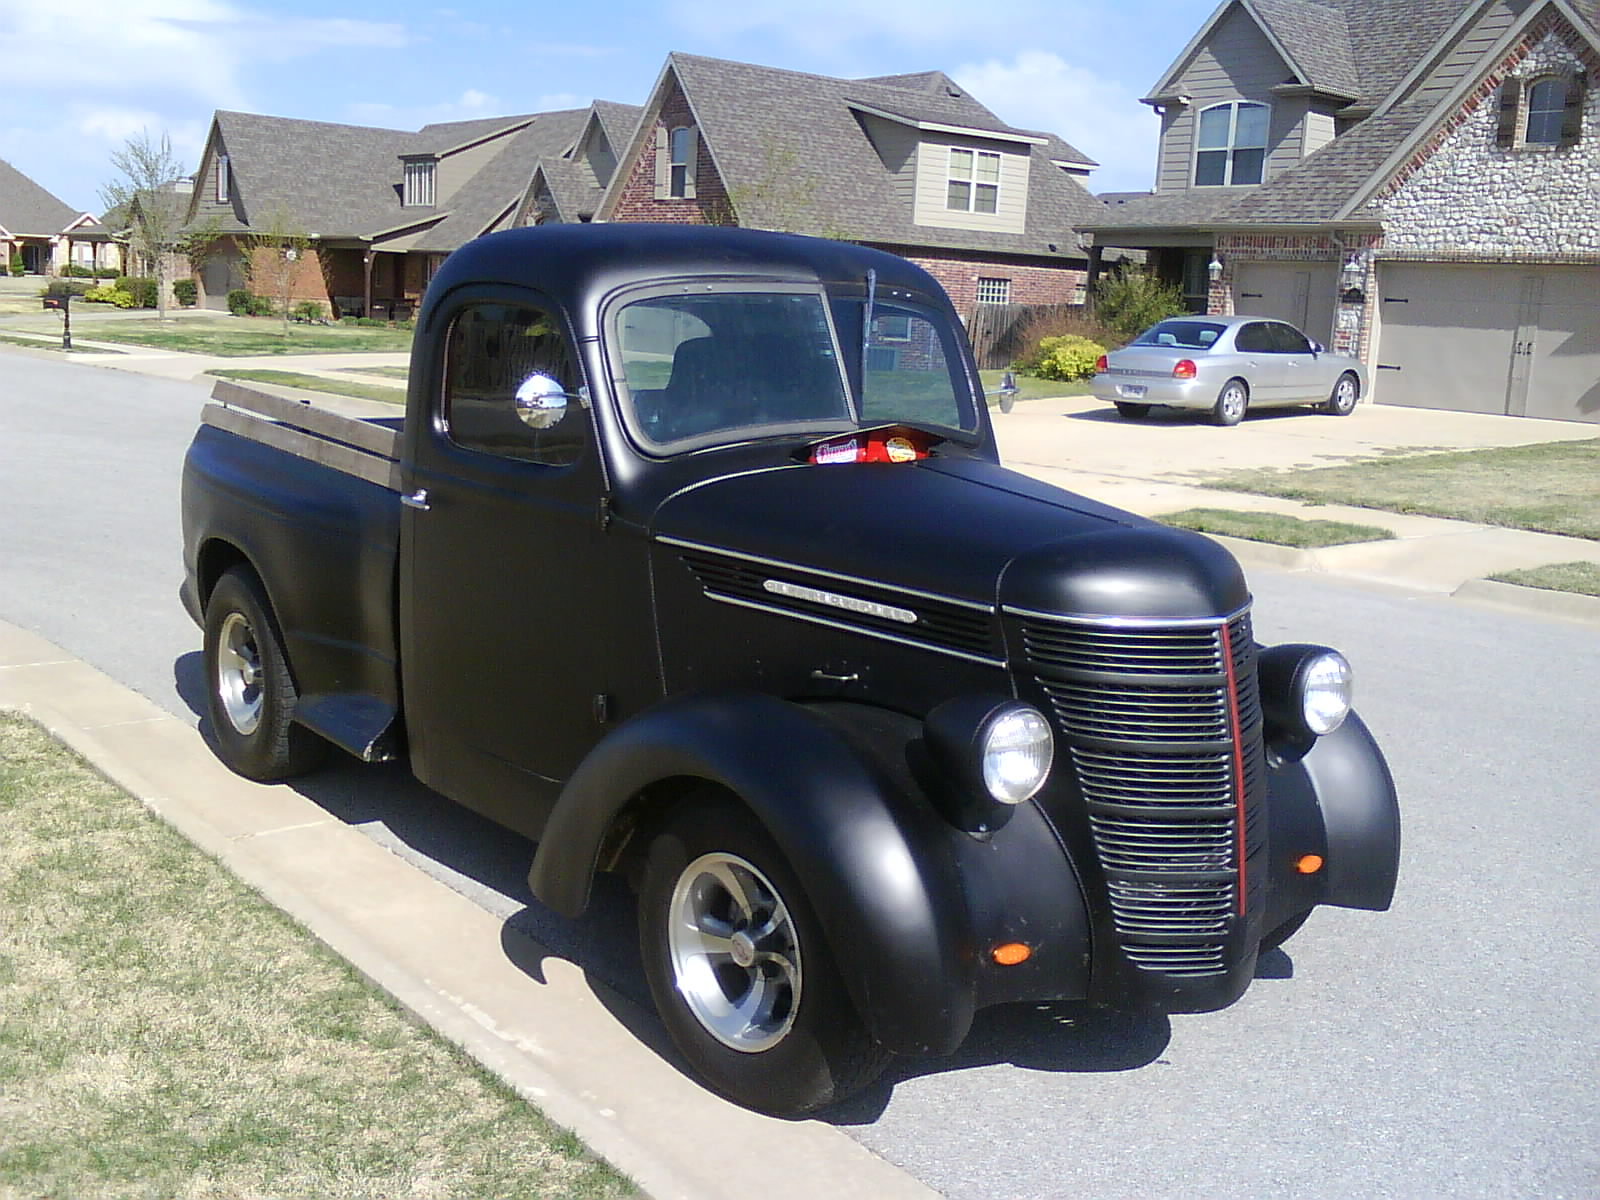 [coolest+truck]